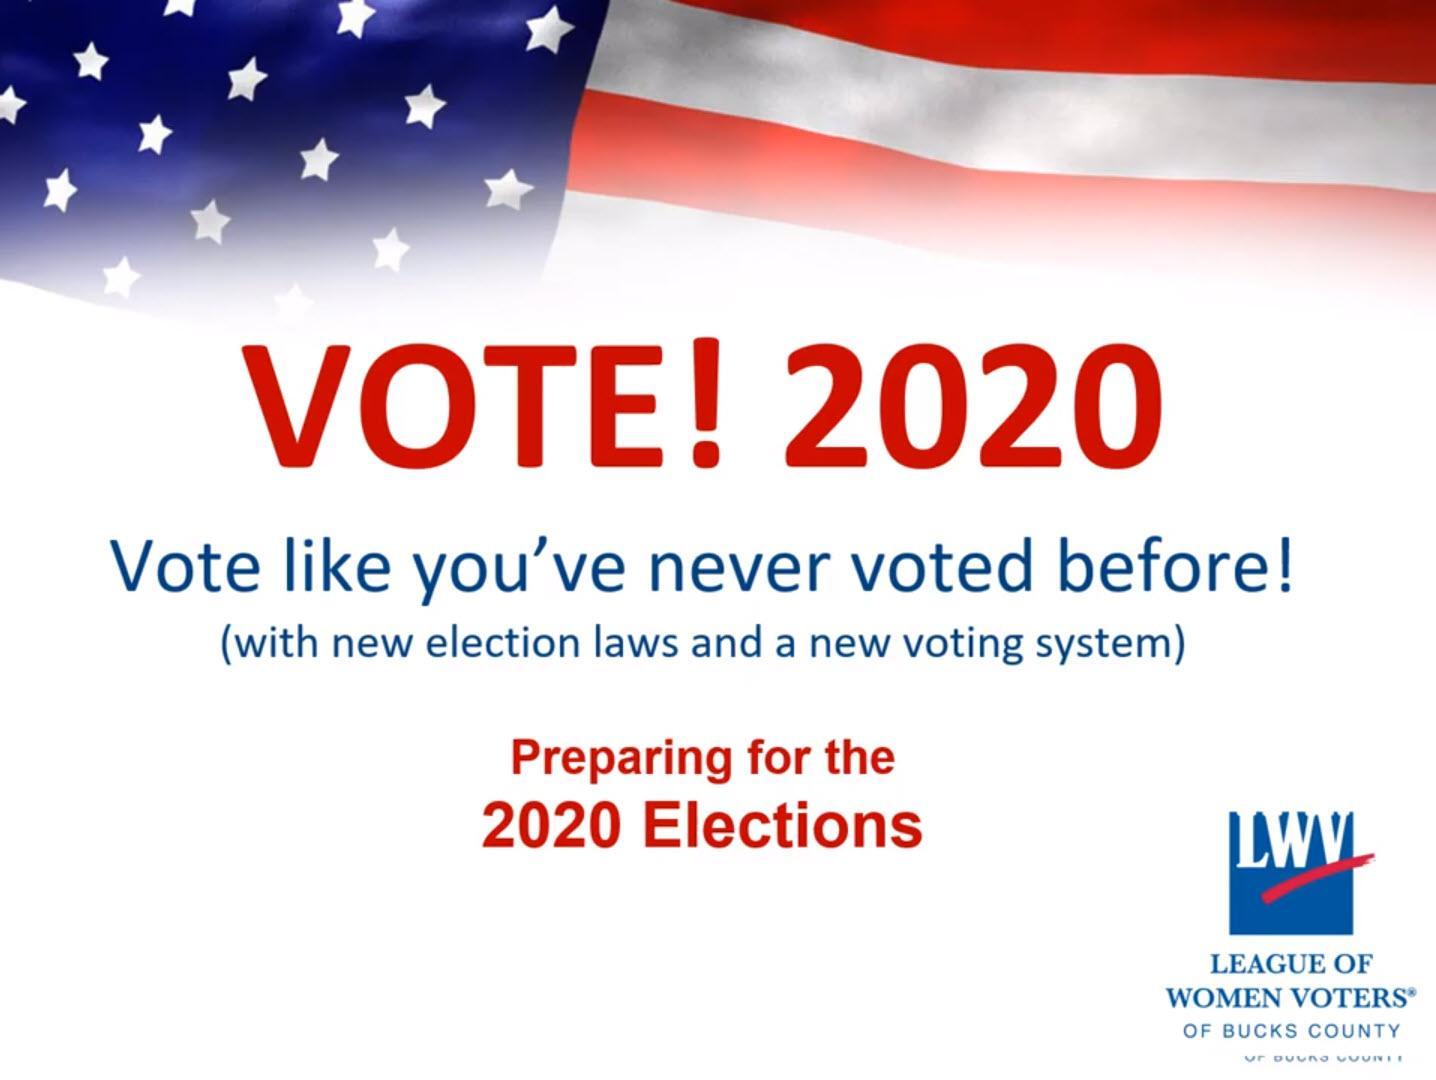 Vote 2020 !!